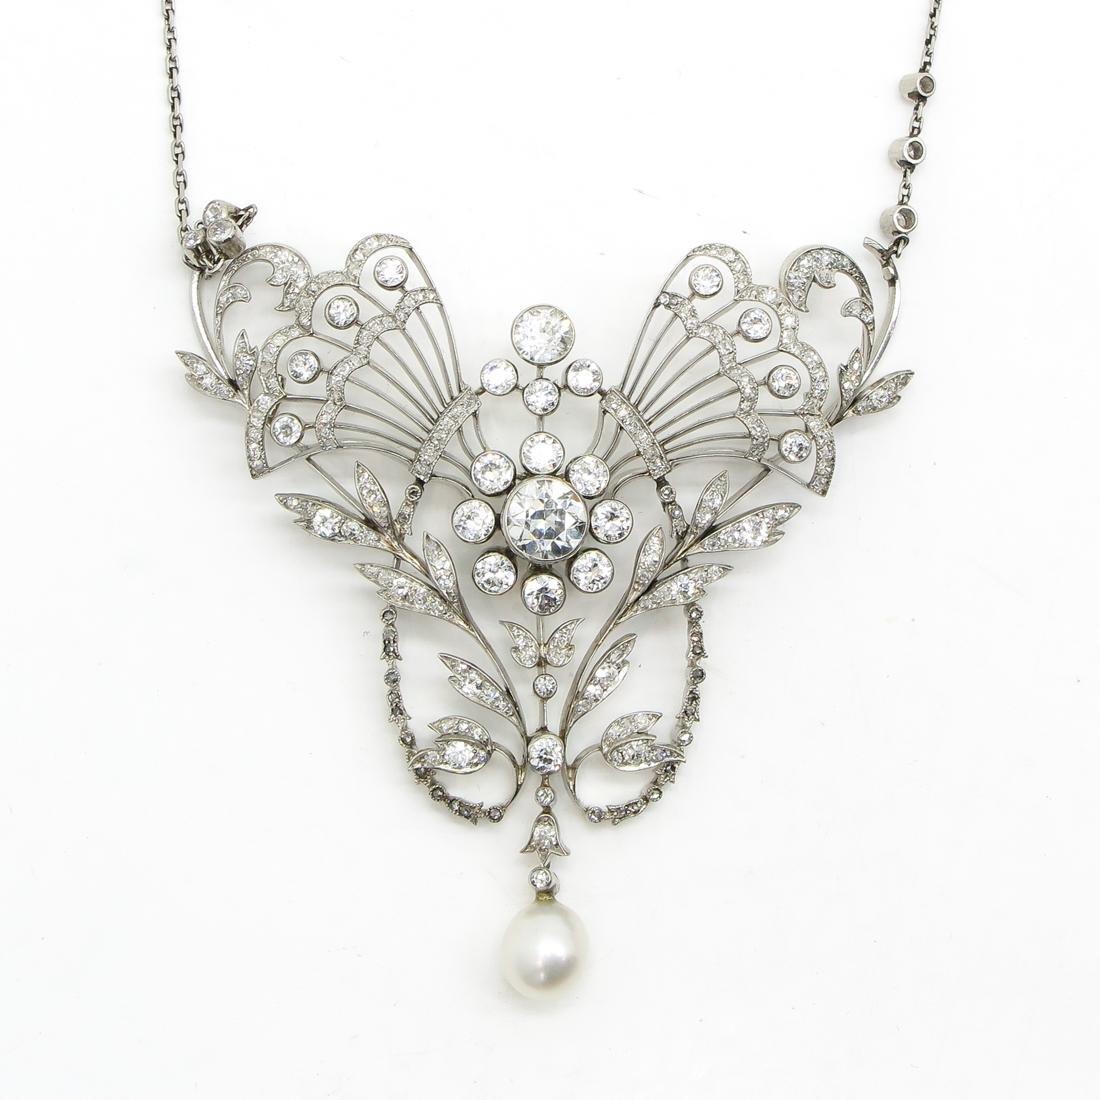 18KWG Art Nouveau Period Diamond Necklace